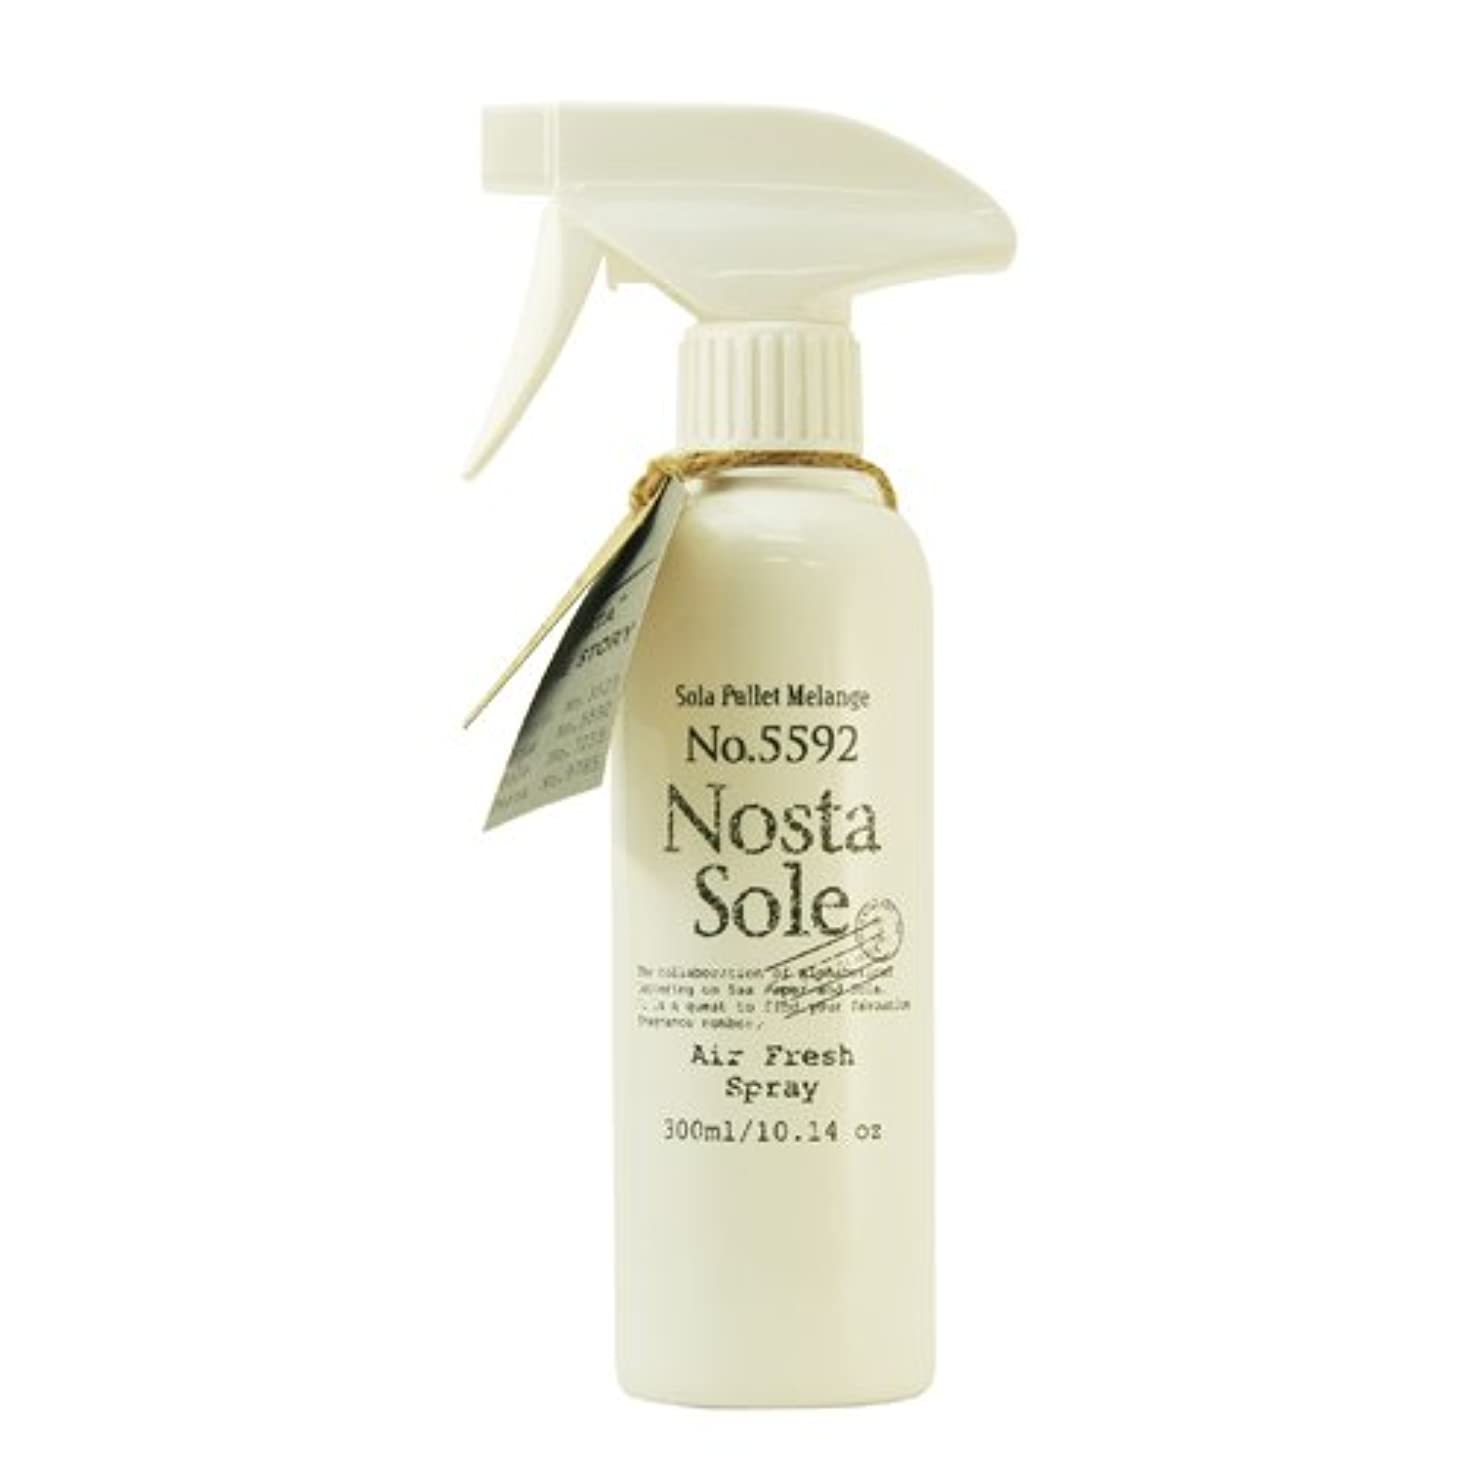 Nosta ノスタ Air Fresh Spray エアーフレッシュスプレー(ルームスプレー)Sole ソーレ / 太陽